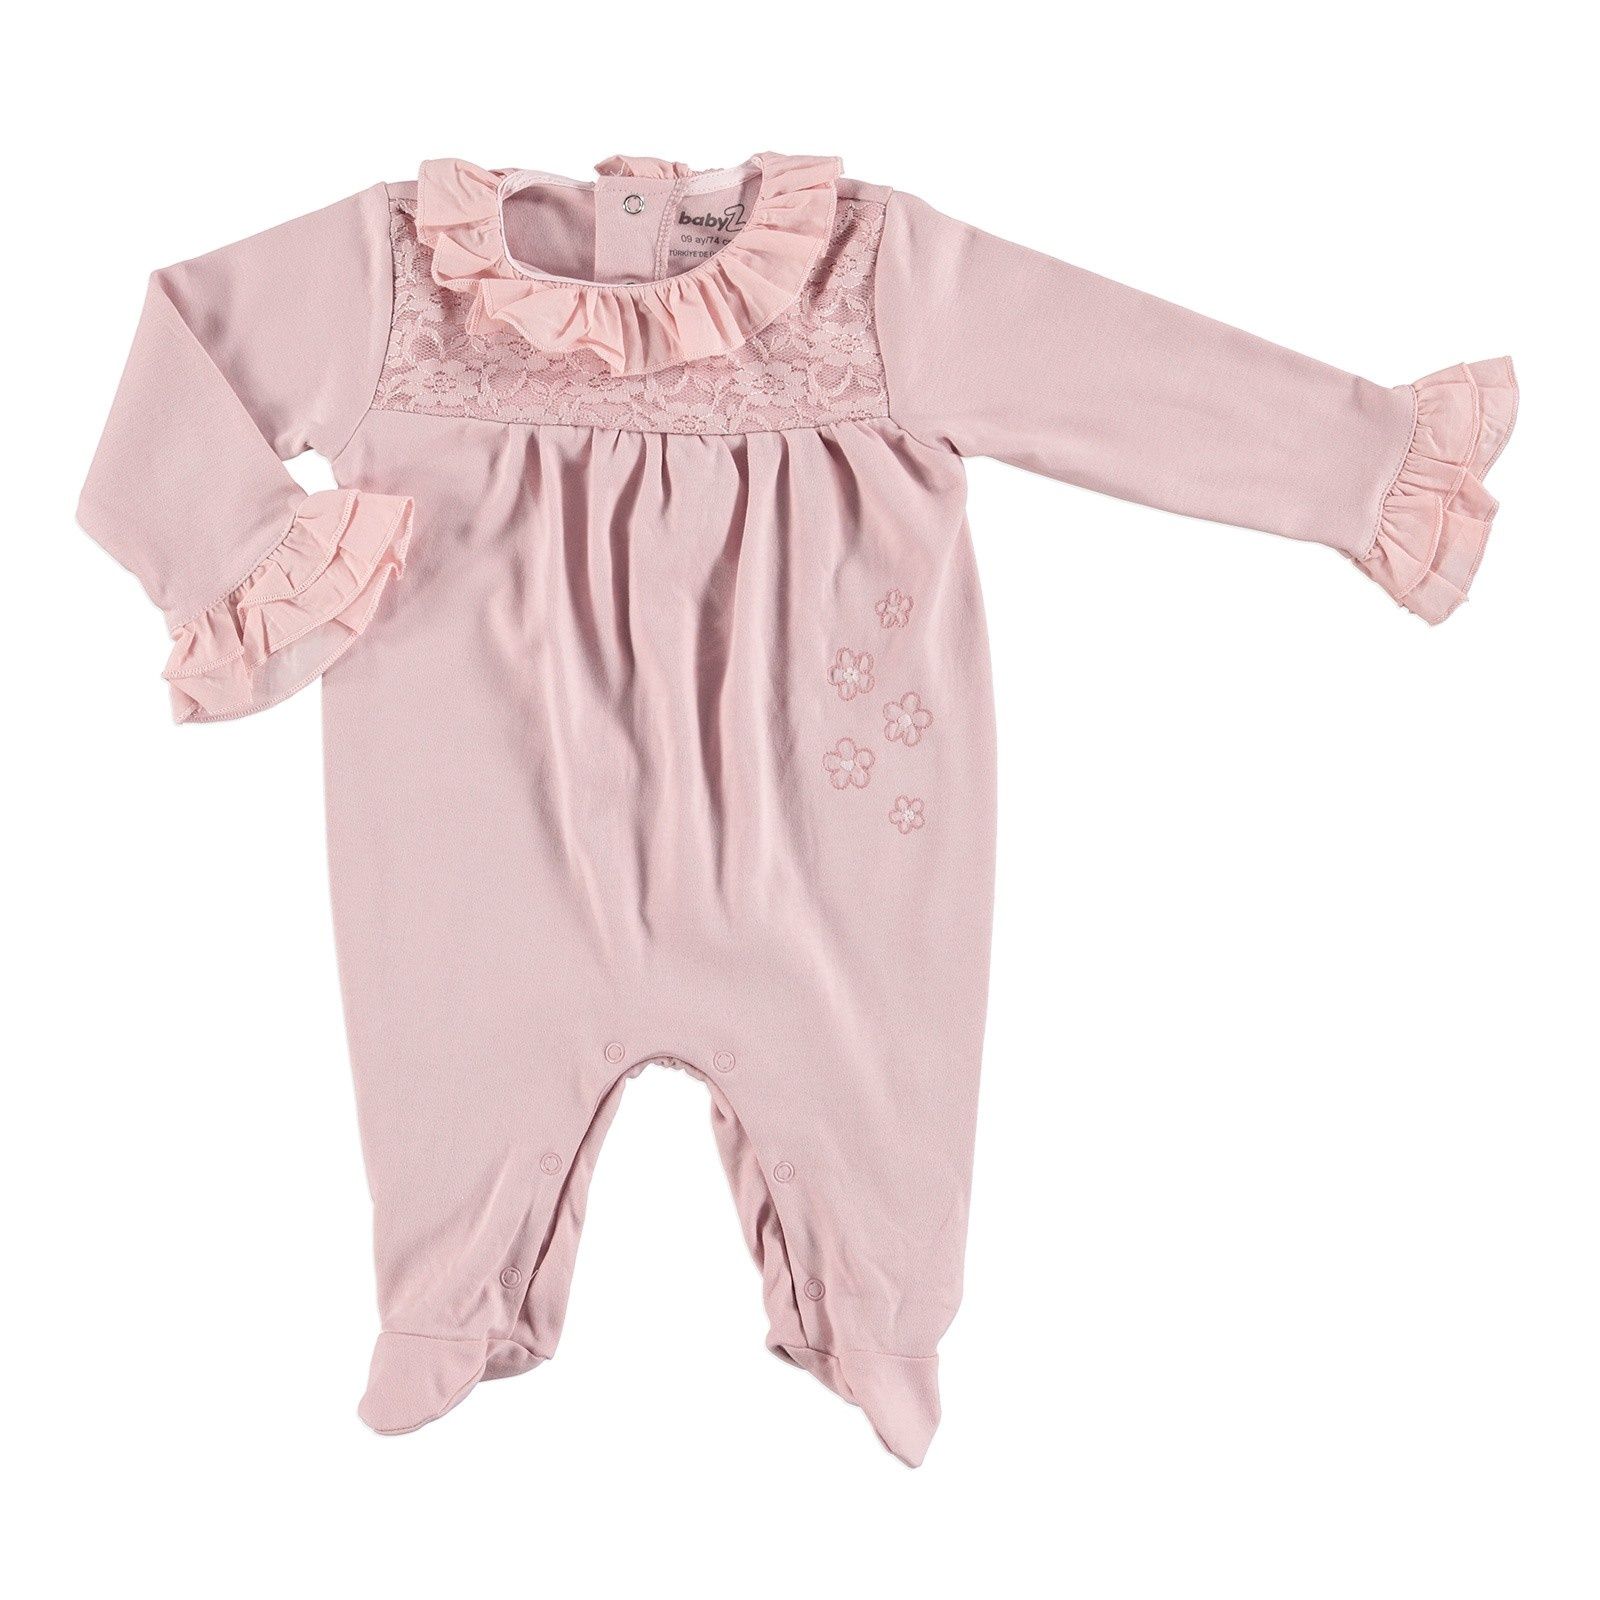 Ebebek BabyZ Baby Lacy Detail Footed Romper